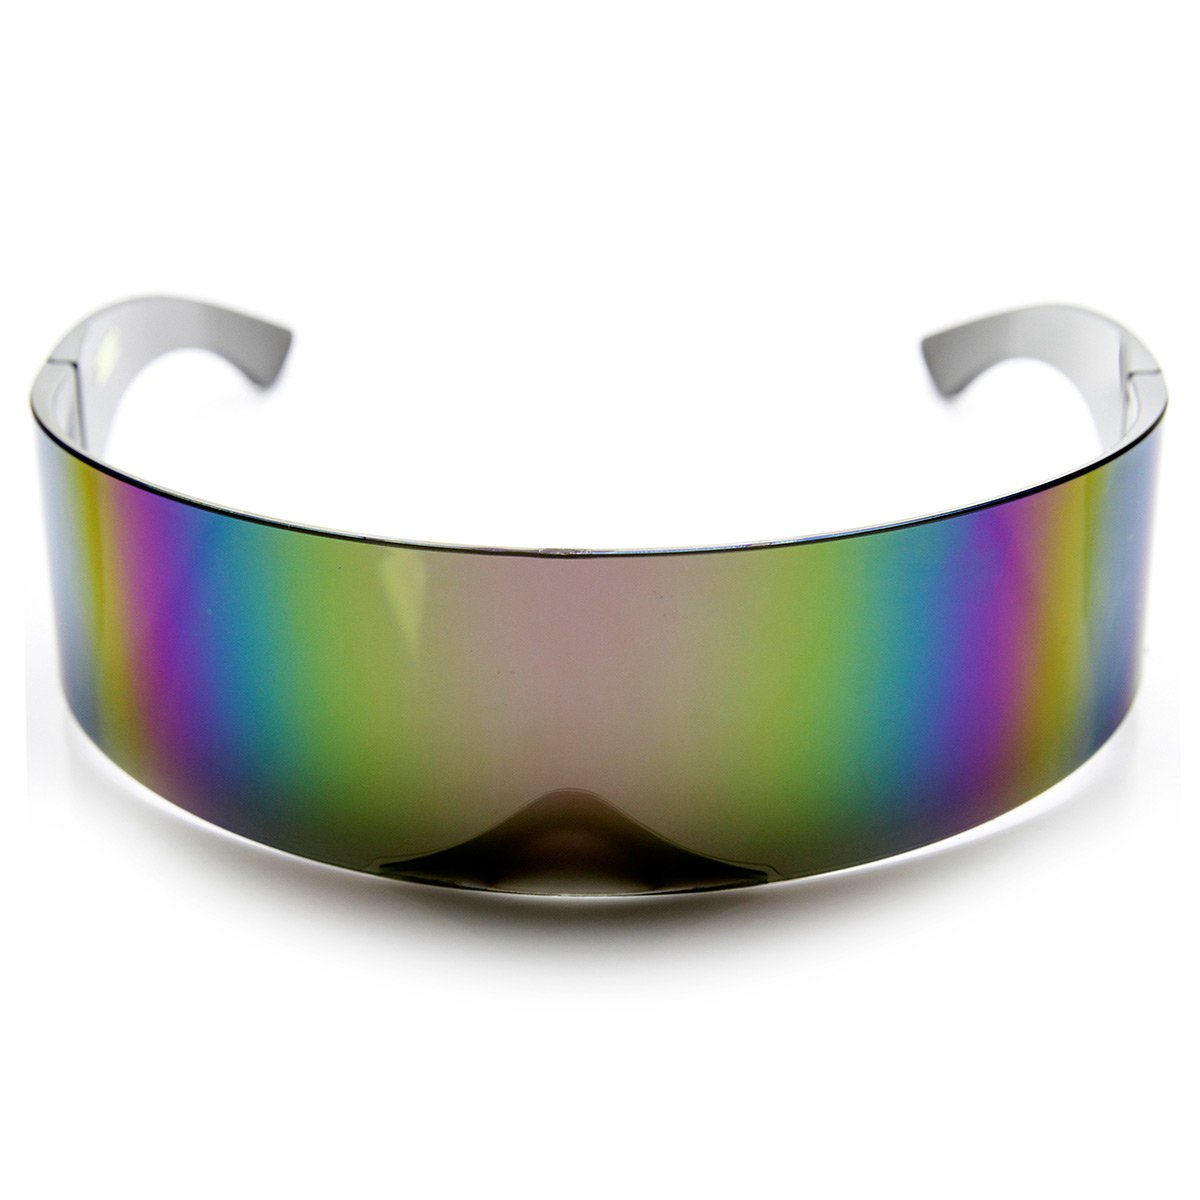 zeroUV - Futuristic Wrap Around Monoblock Shield Sunglasses frame&optic